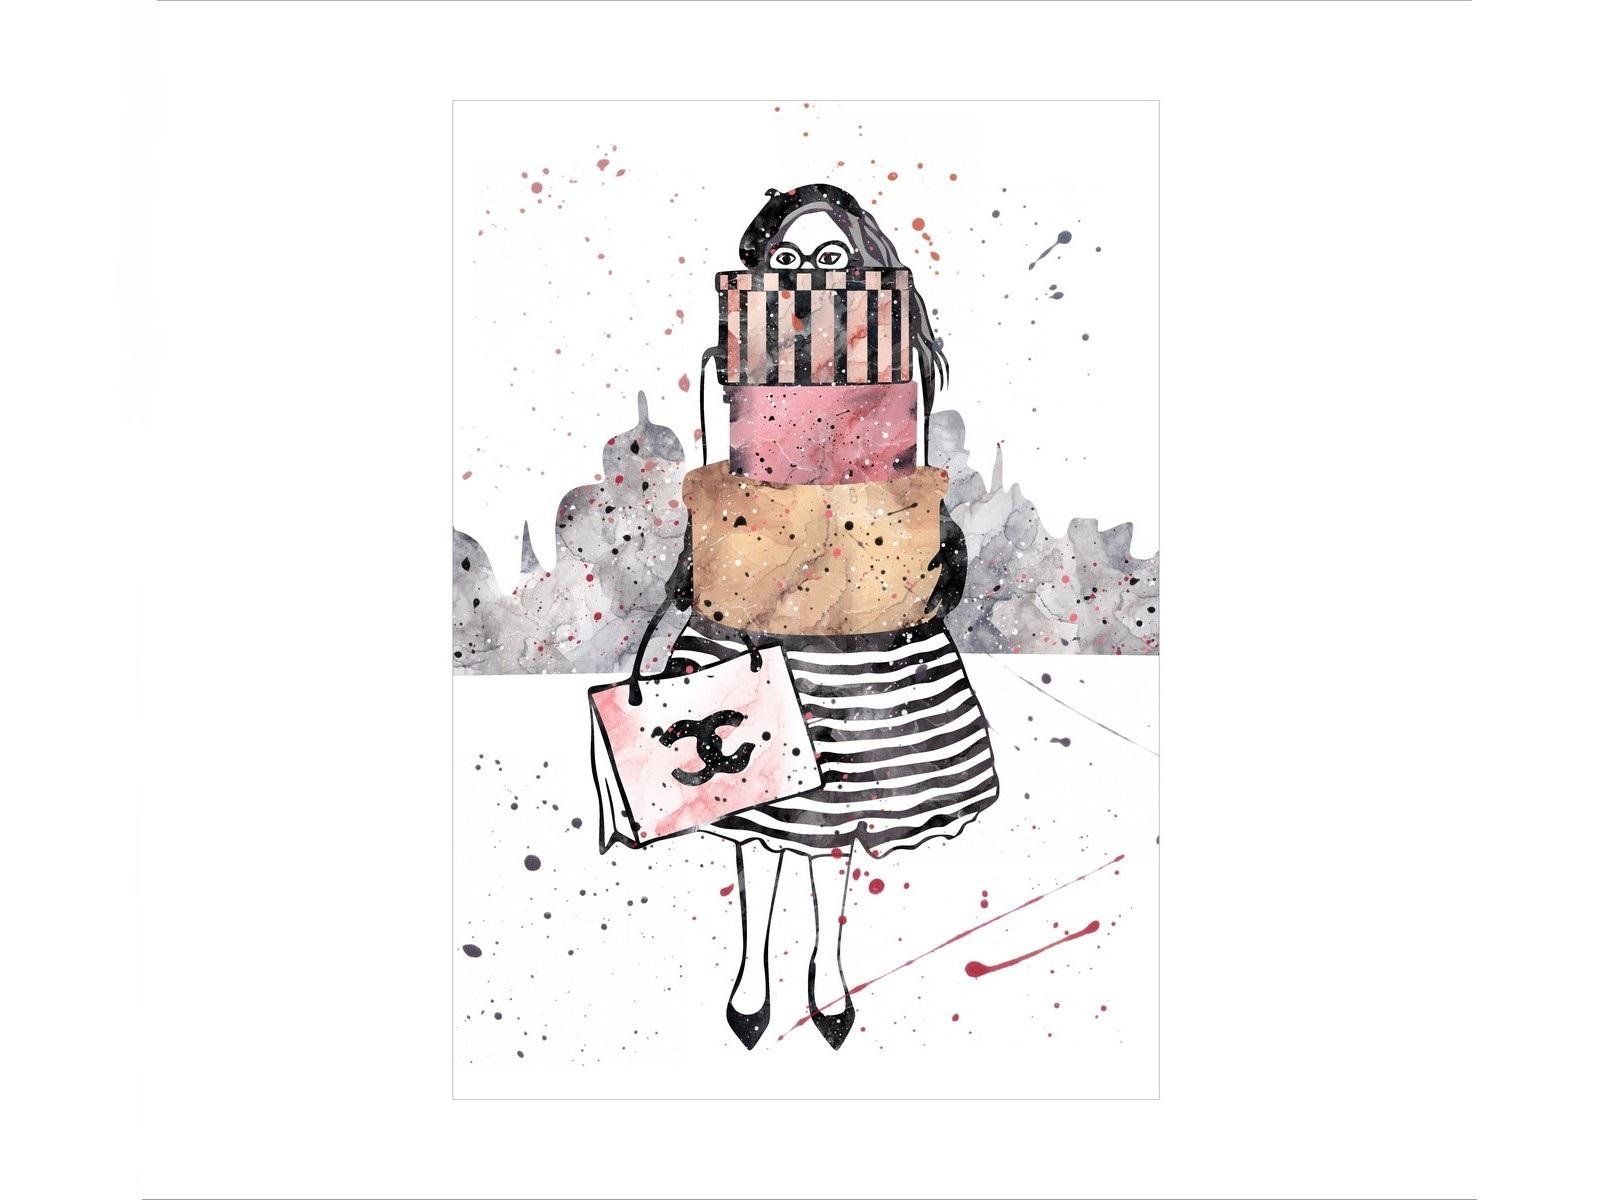 Постер Девушка с подаркамиПостеры<br><br><br>Material: Бумага<br>Width см: 30<br>Depth см: 1,5<br>Height см: 40